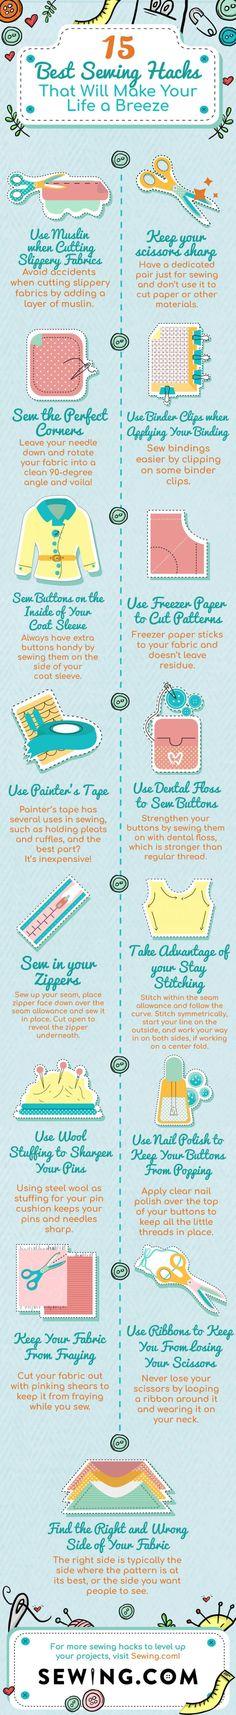 Genius Sewing Hacks to Make Your Life Easier | Best Sewing Hacks That Will Make Your Life a Breeze